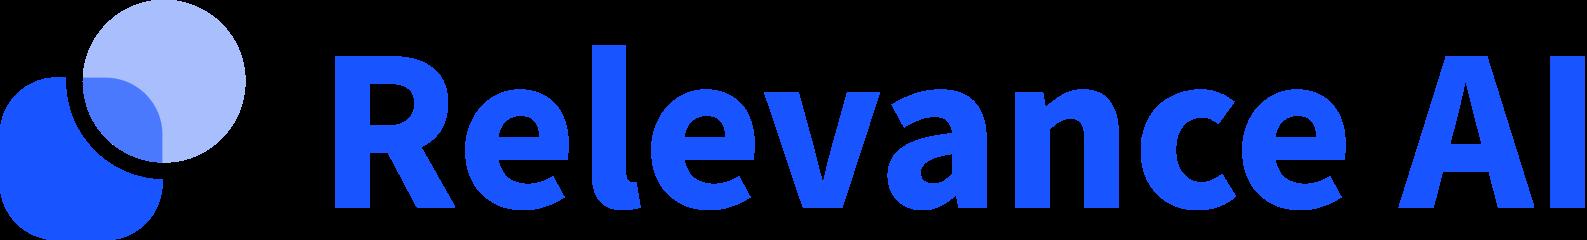 relevance ai logo